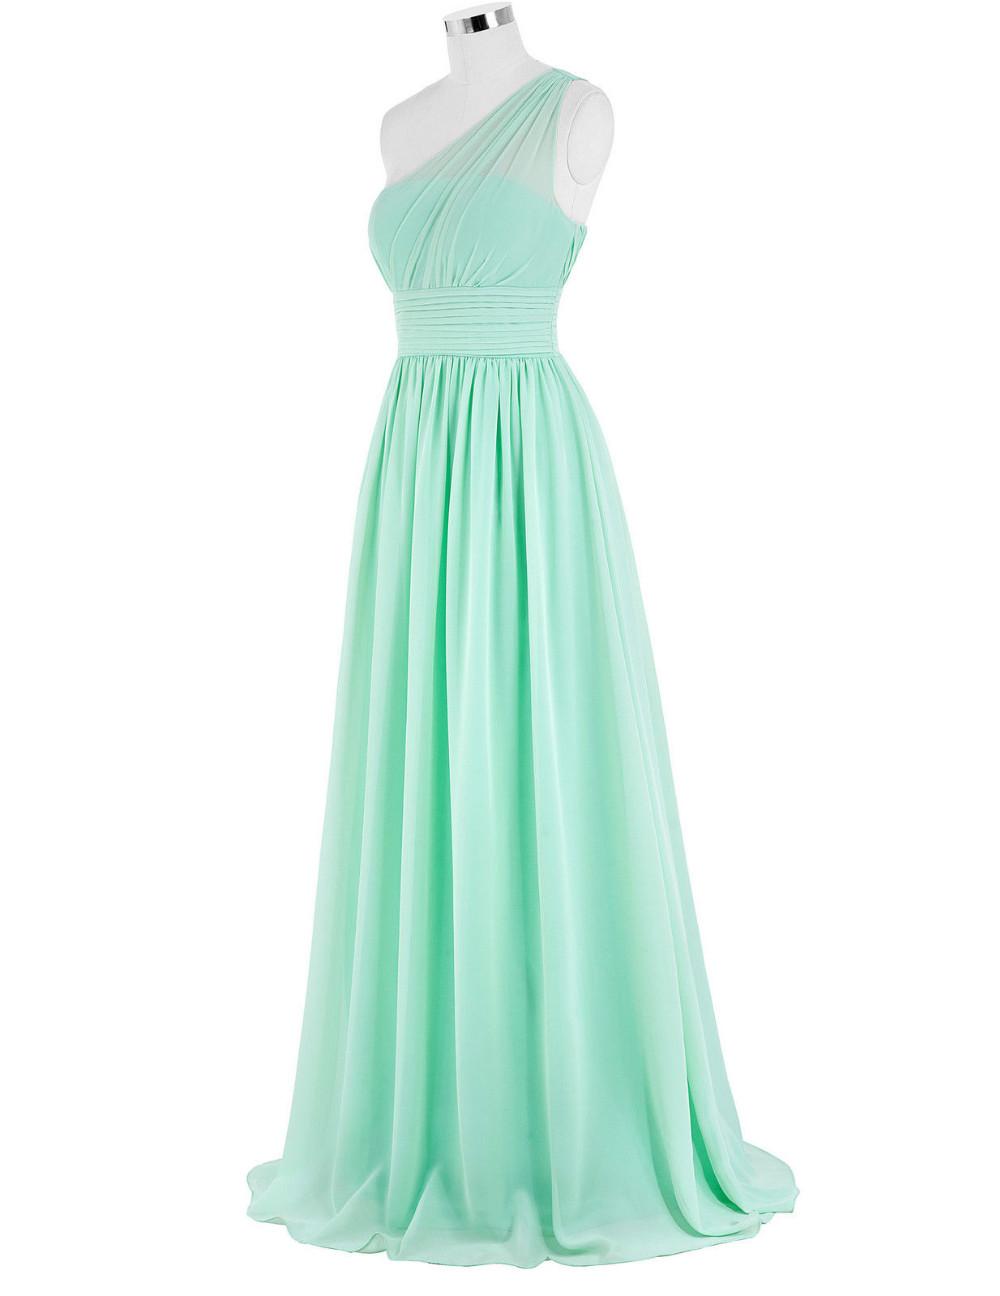 Kate Kasin Mint Green Bridesmaid Dresses Long Wedding Party Dresses One Shouler Bruidsmeisjes Jurk Pink Bridemaid Dress 0200 8